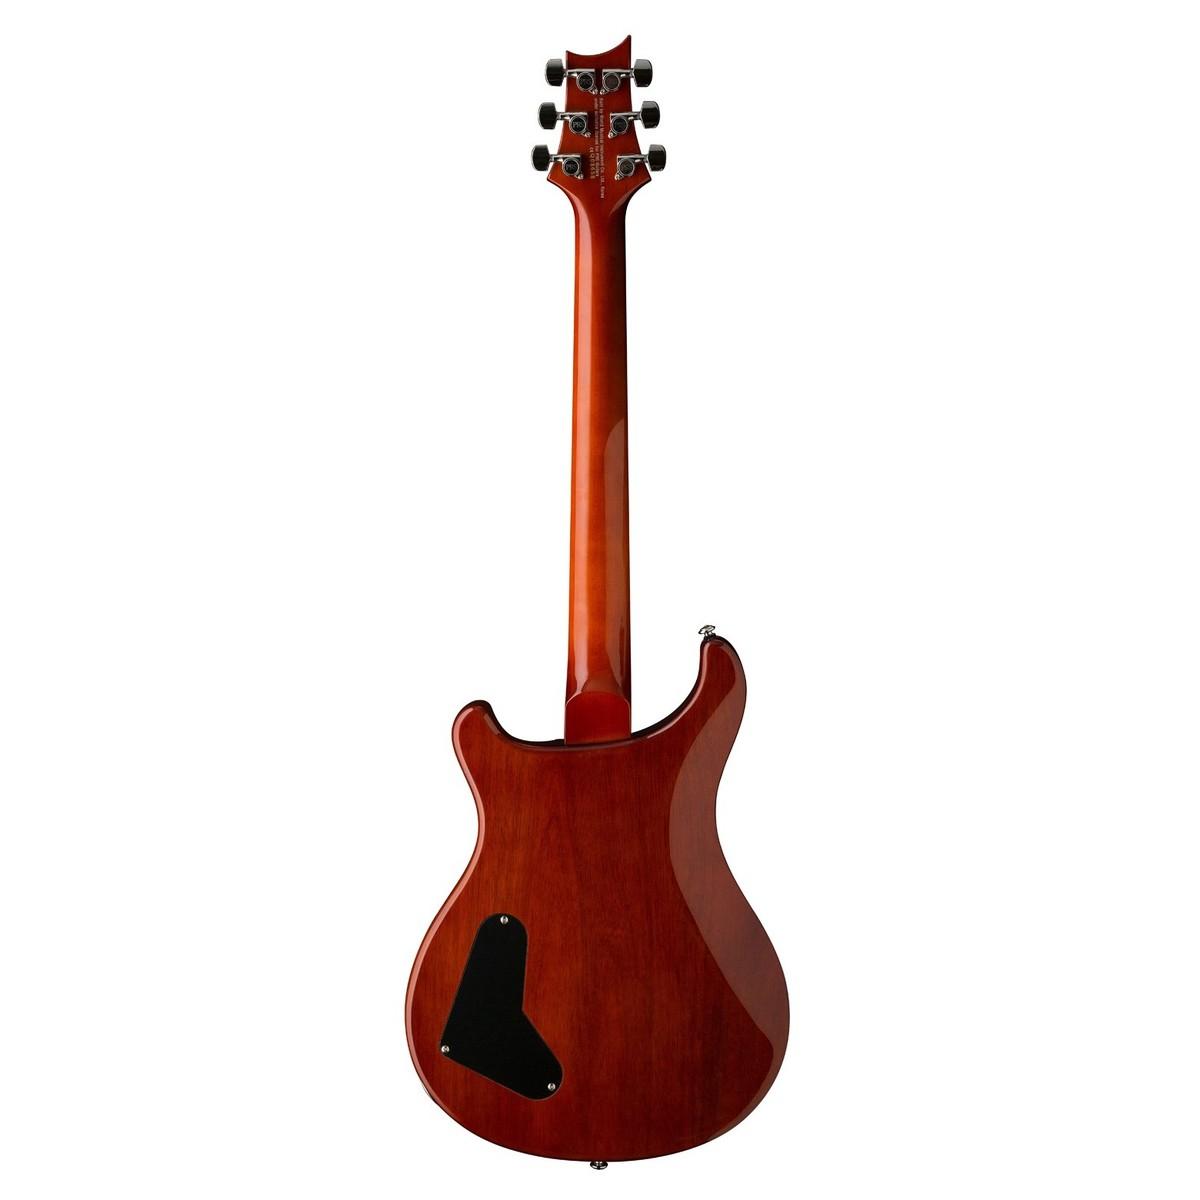 Reborn handmade guitars - Home Facebook